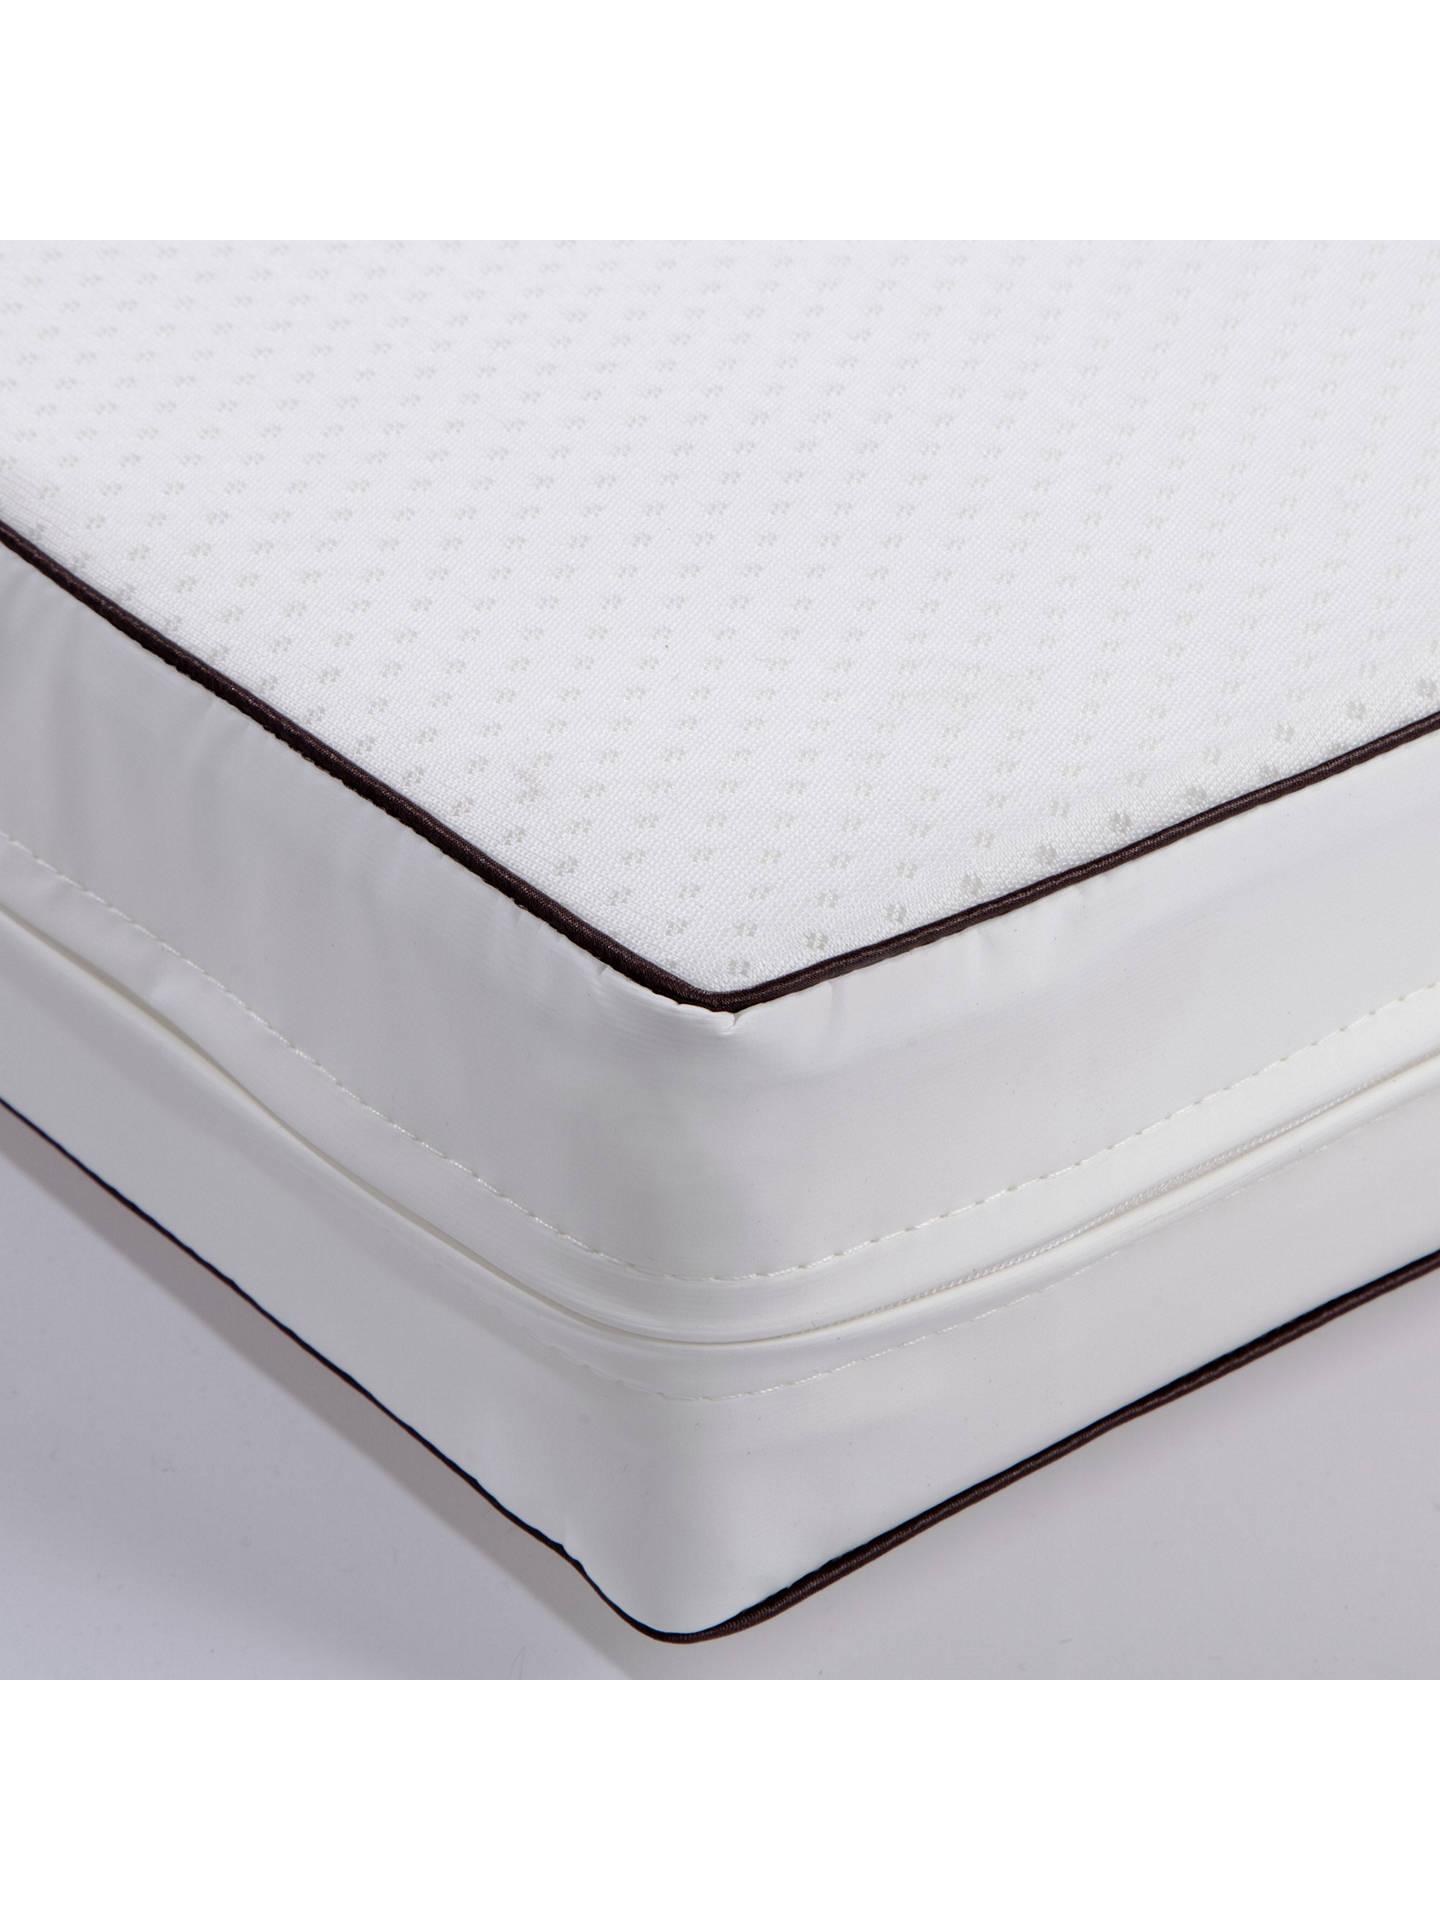 best service 1d5d1 f689e John Lewis & Partners Spring Cotbed Mattress, 140 x 70cm